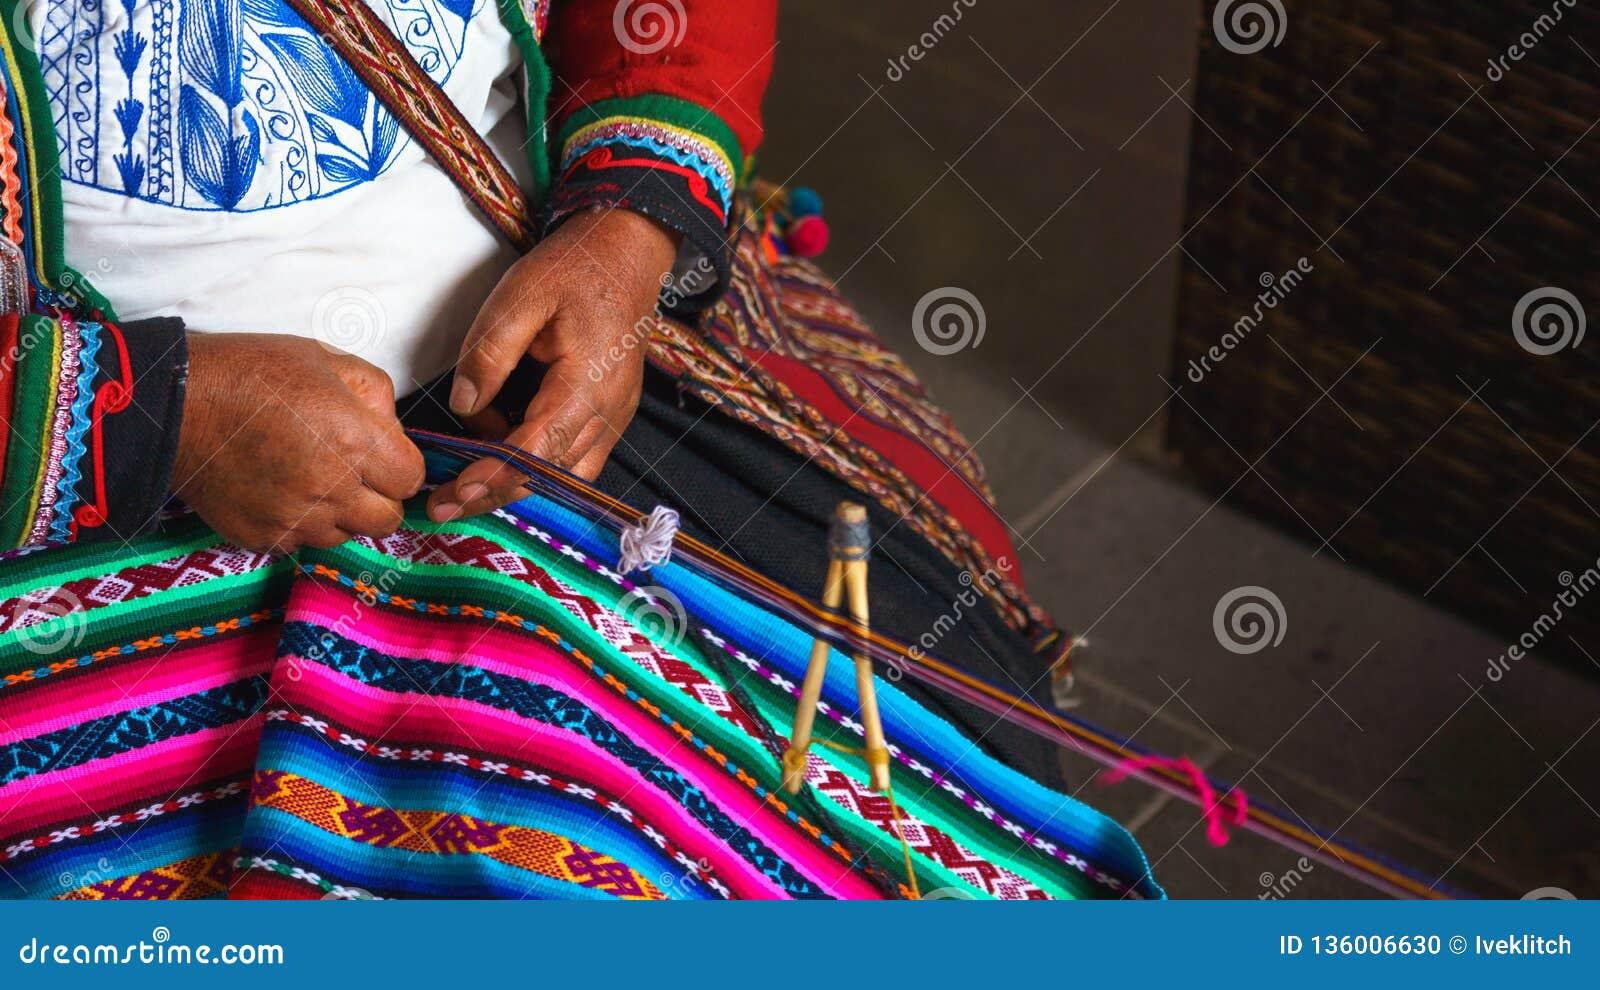 Close up of weaving in Peru. Cusco, Peru. Woman dressed in colorful traditional native Peruvian closing knitting a carpet with